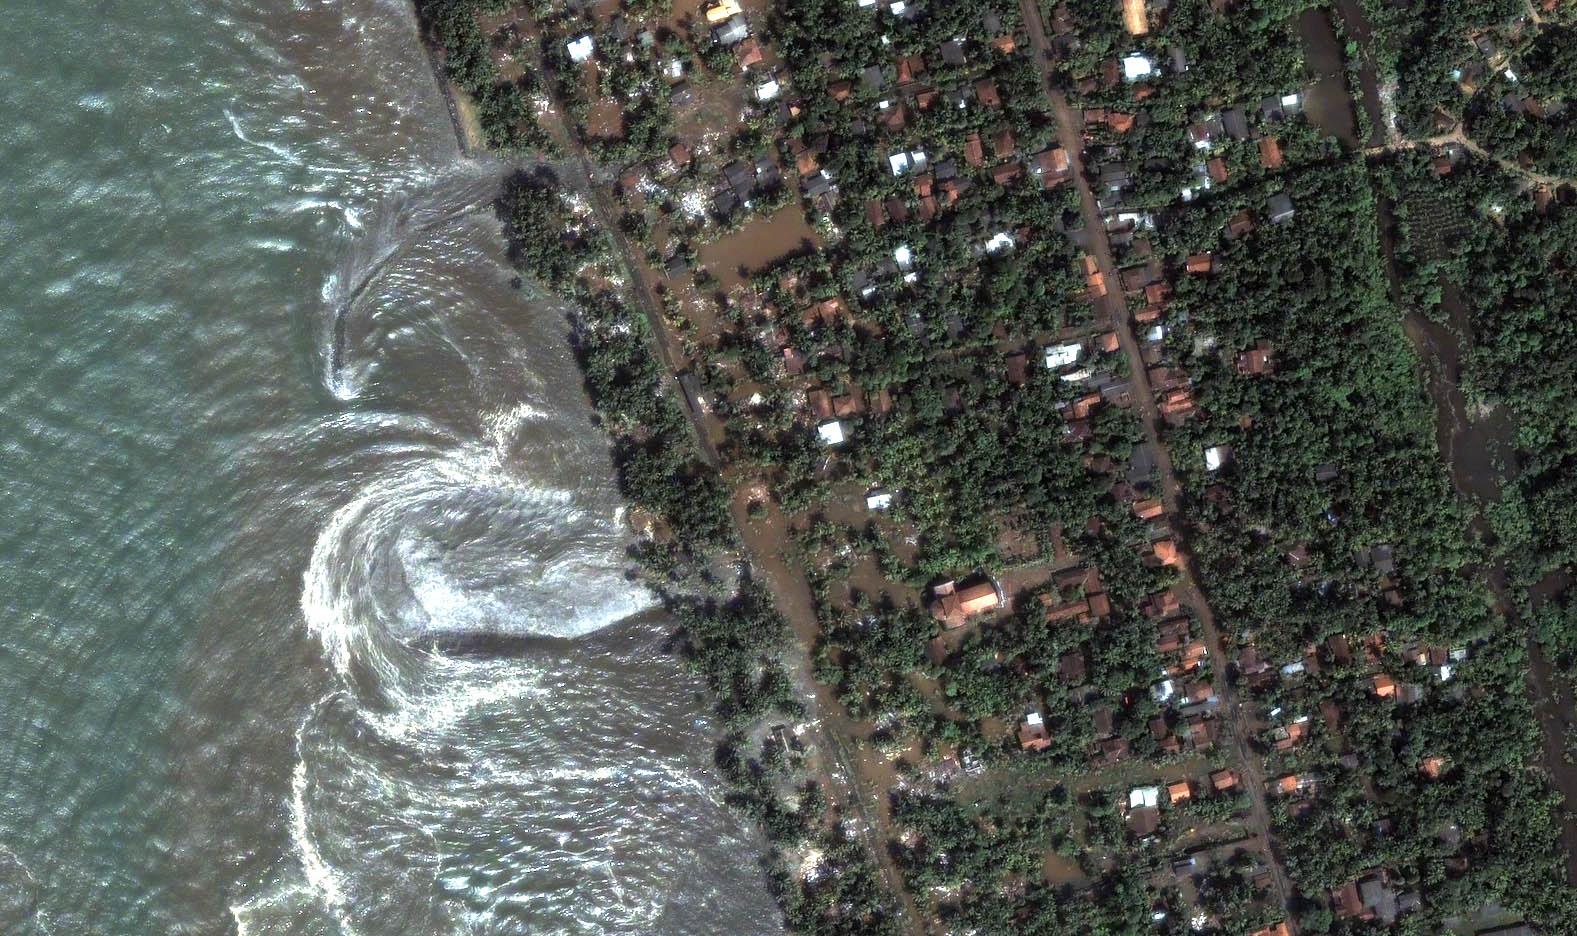 mengerikan tragis seram: korban tsunami dan dasyatnya